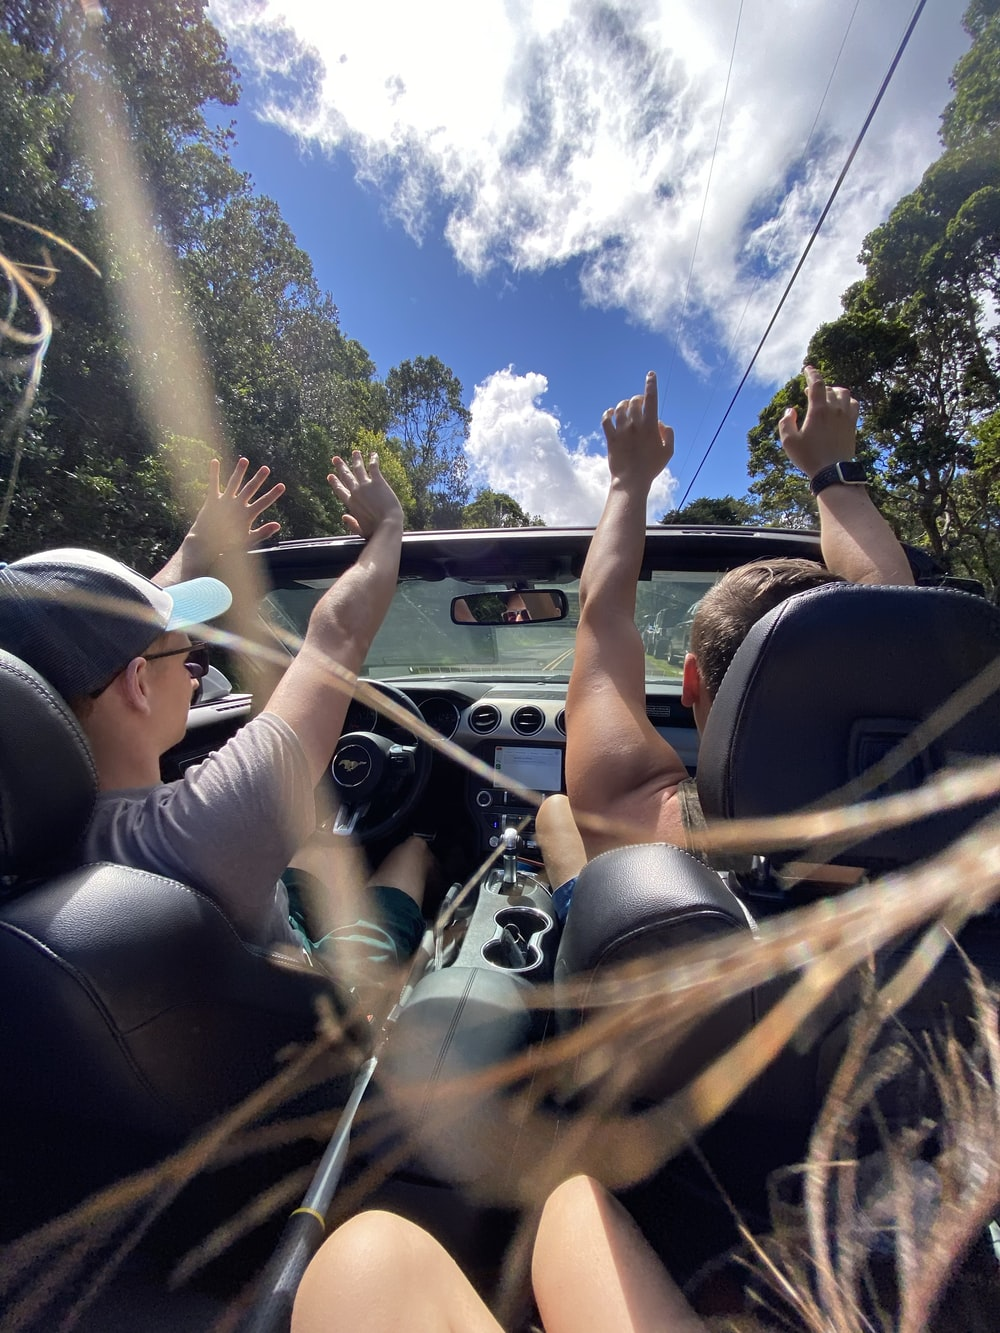 people riding on car during daytime